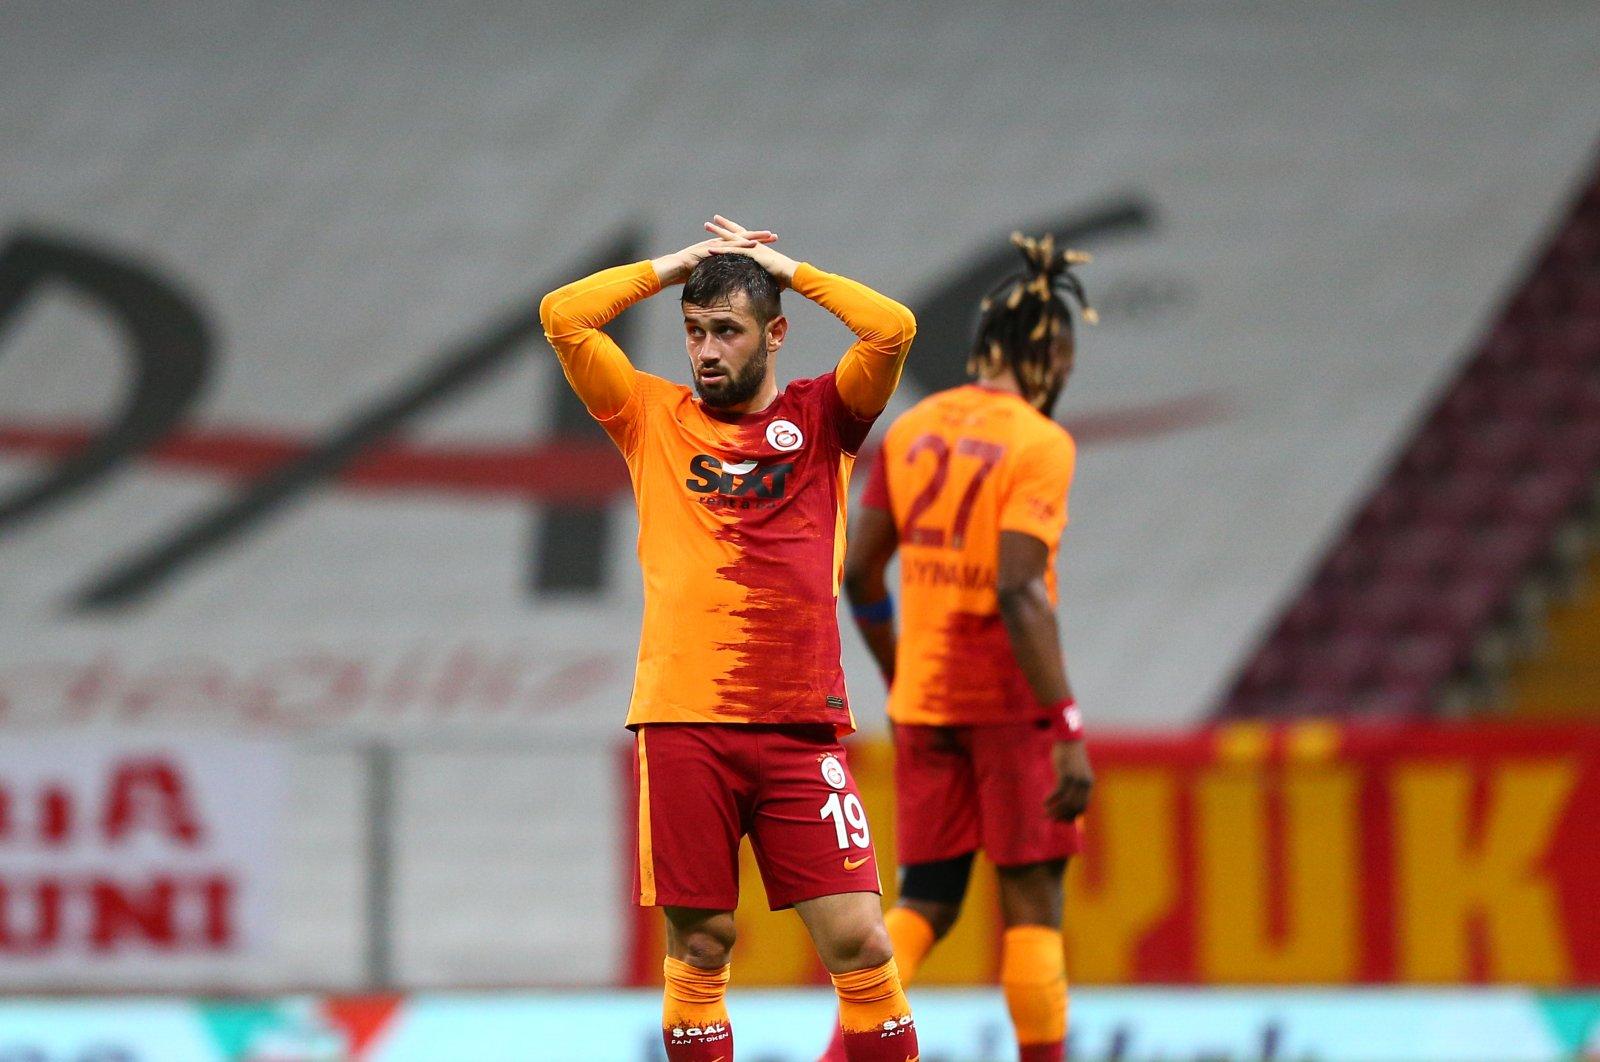 Galatasaray's Ömer Bayram reacts after the Süper Lig match against Alanyaspor, in Istanbul, Turkey, Oct. 19, 2020. (AA Photo)